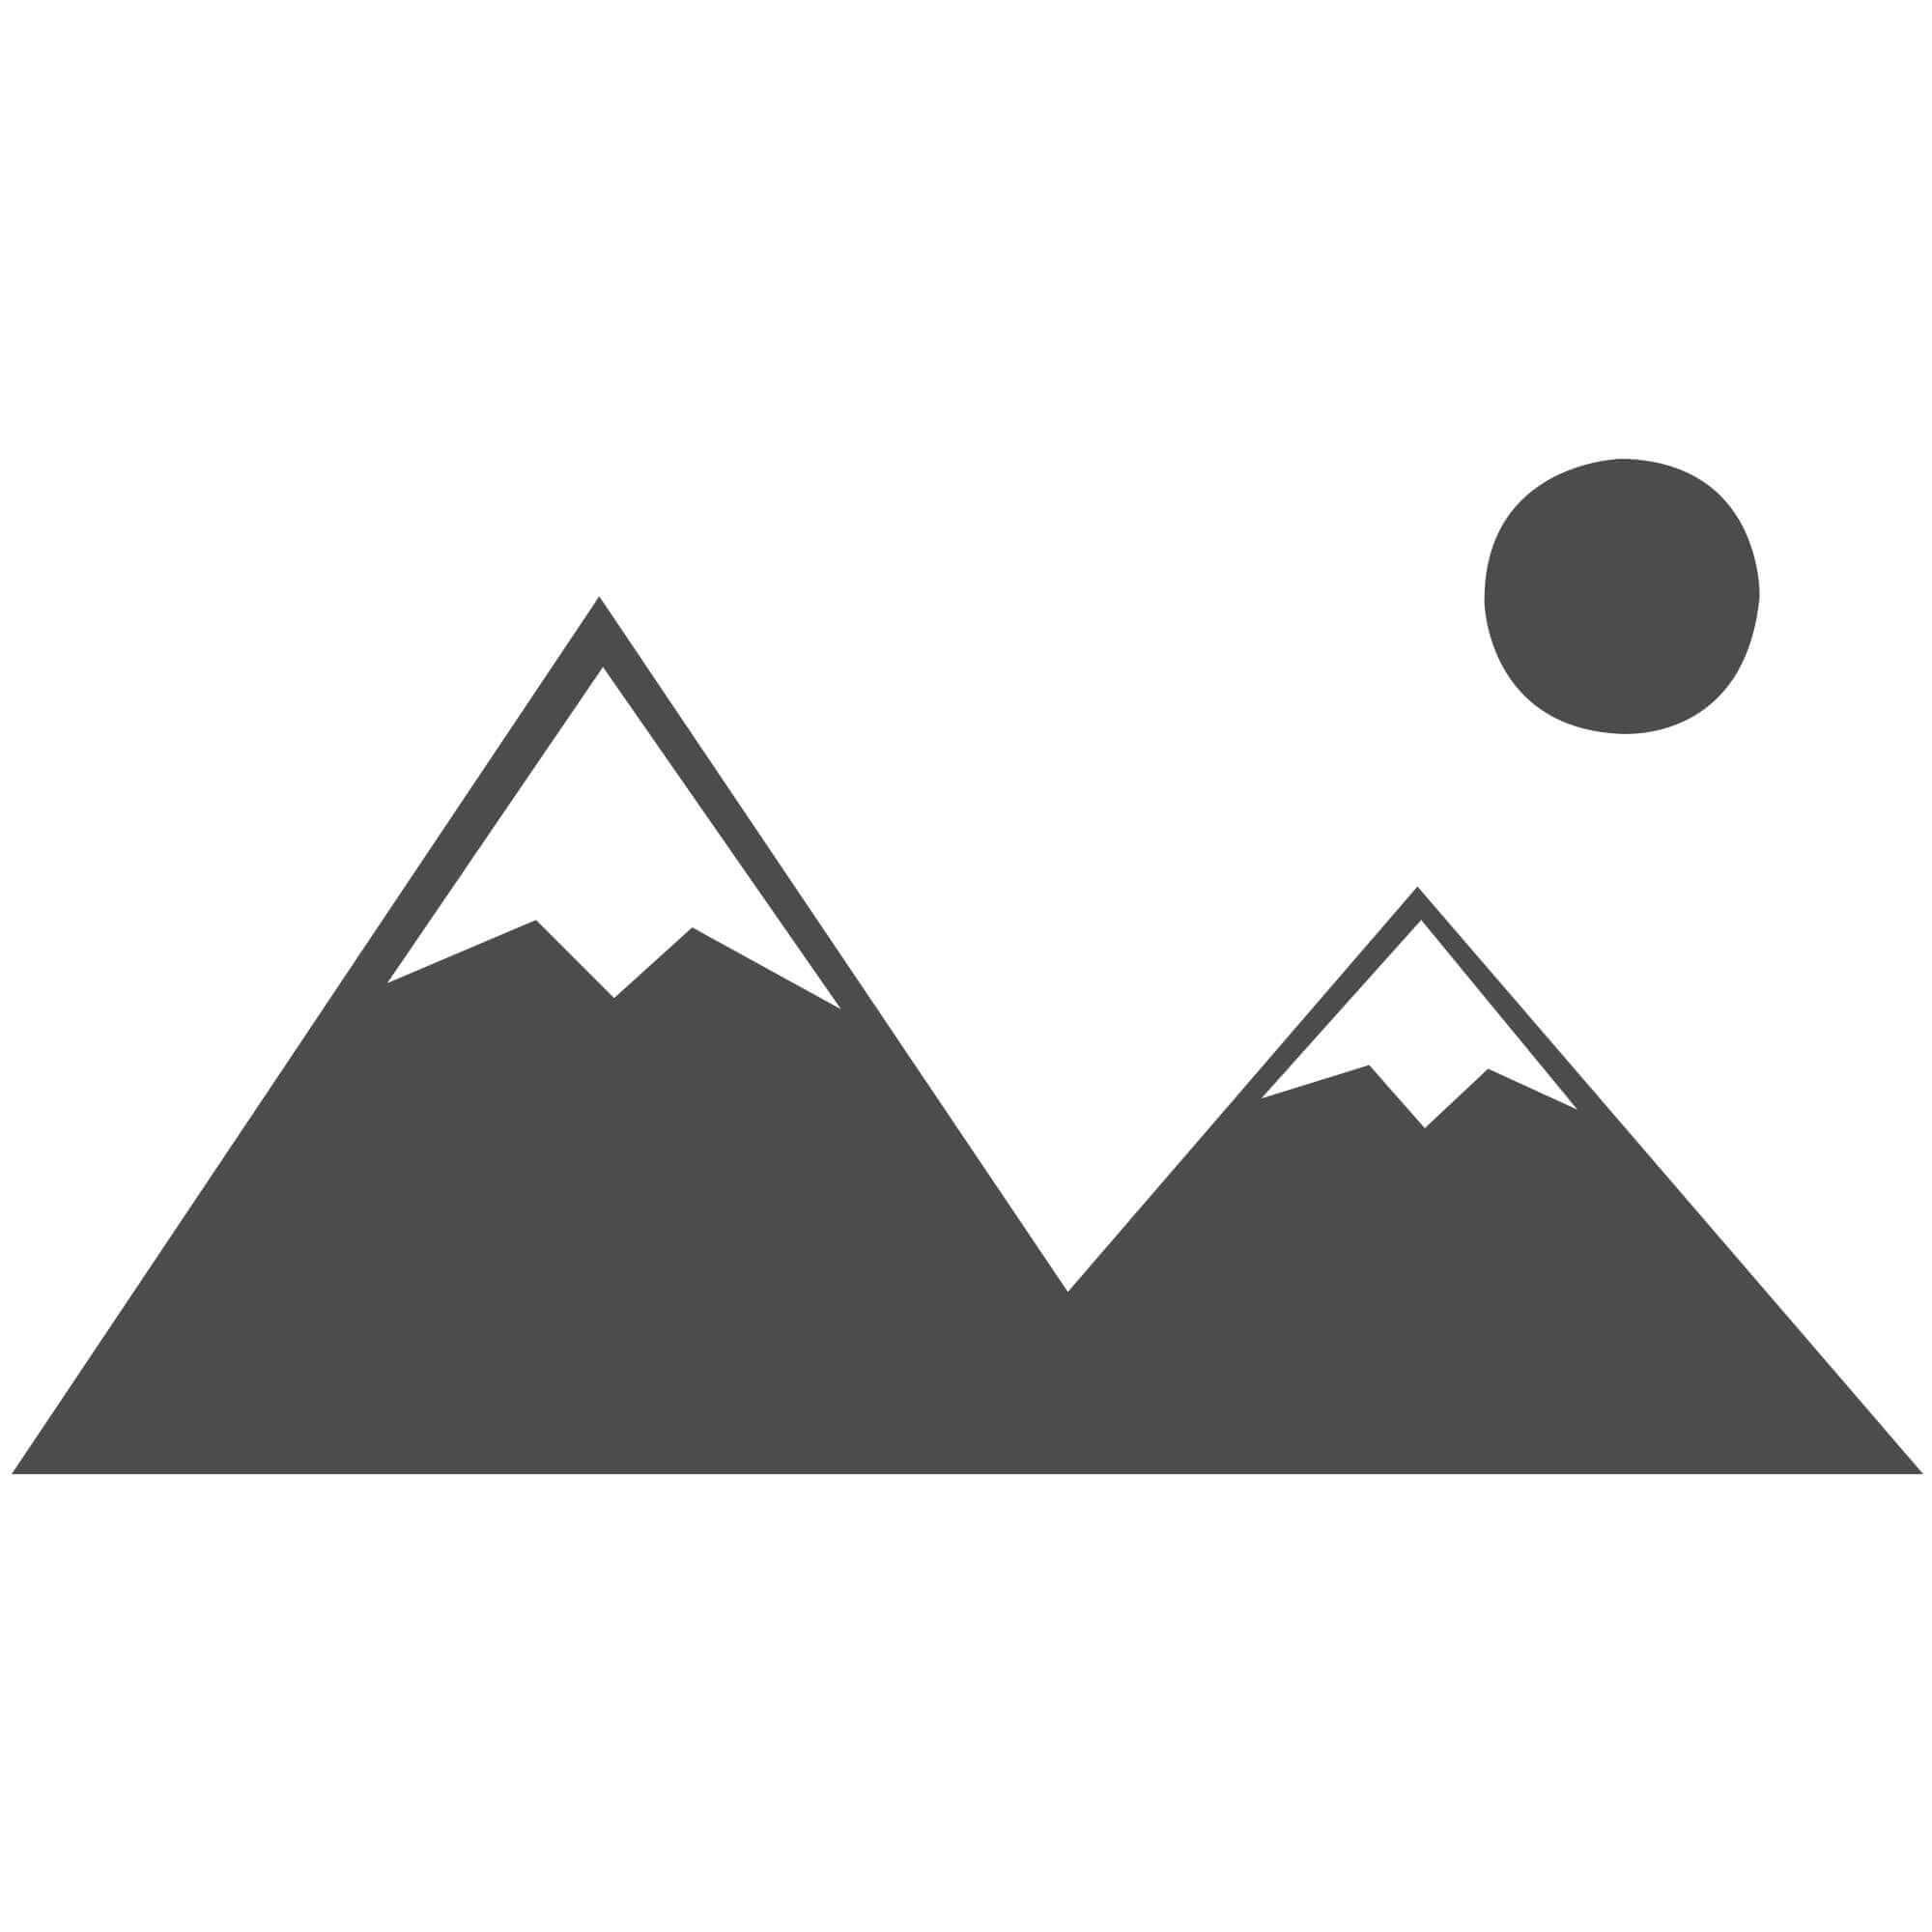 "Athena Shaggy Rug - Taupe - Size 80 x 150 cm (2'8"" x 5')"